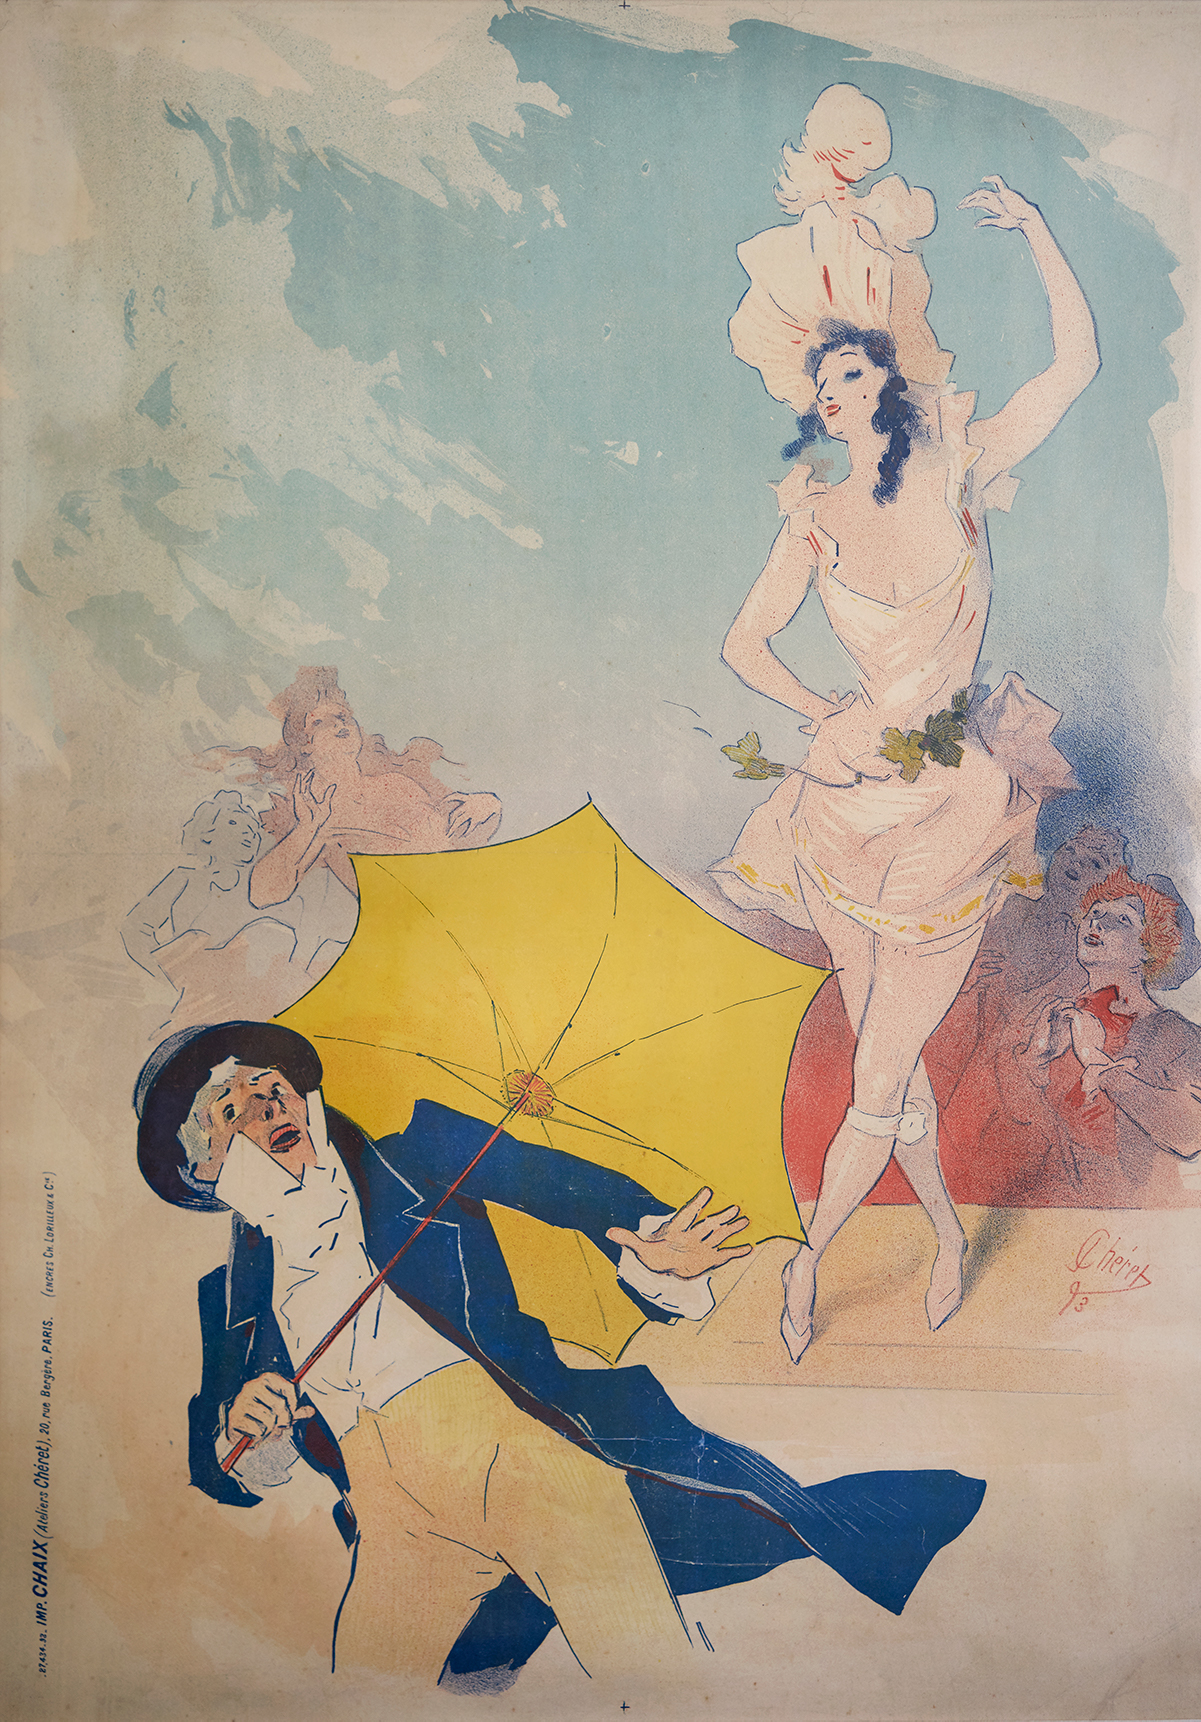 A dancer performs for a man holding an umbrella.